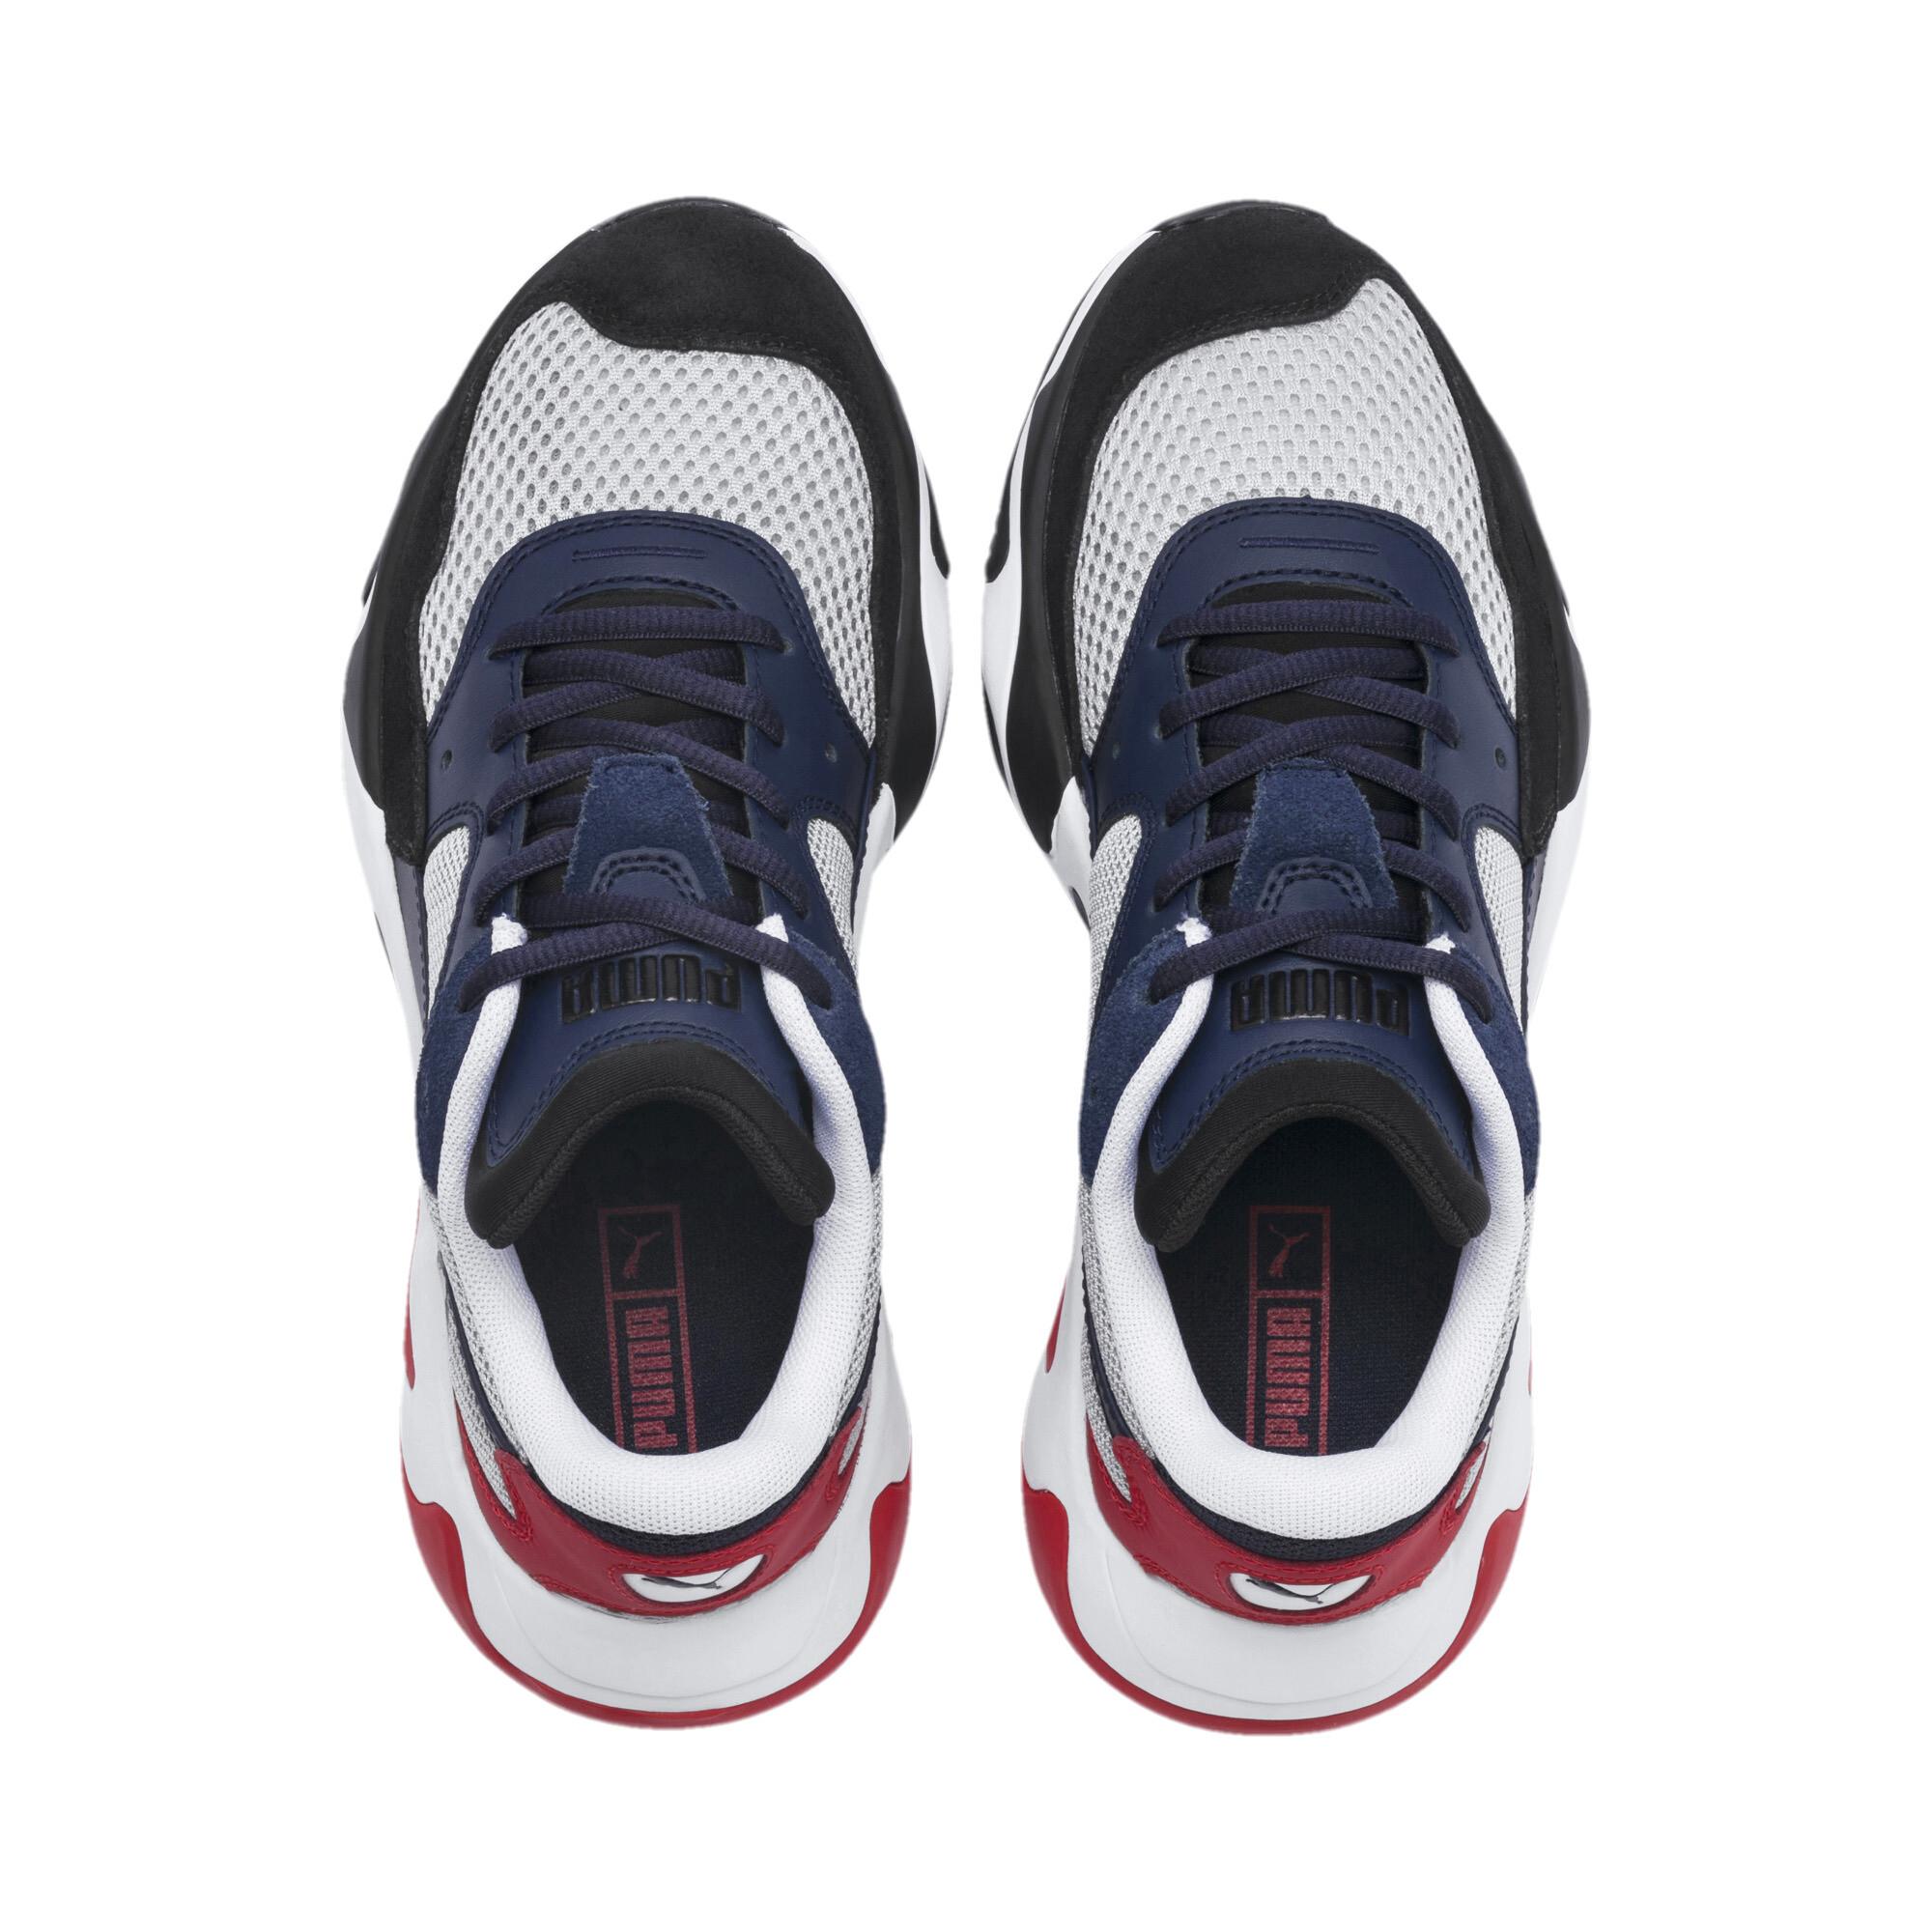 PUMA-Storm-Origin-Sneakers-JR-Kids-Shoe-Kids thumbnail 7